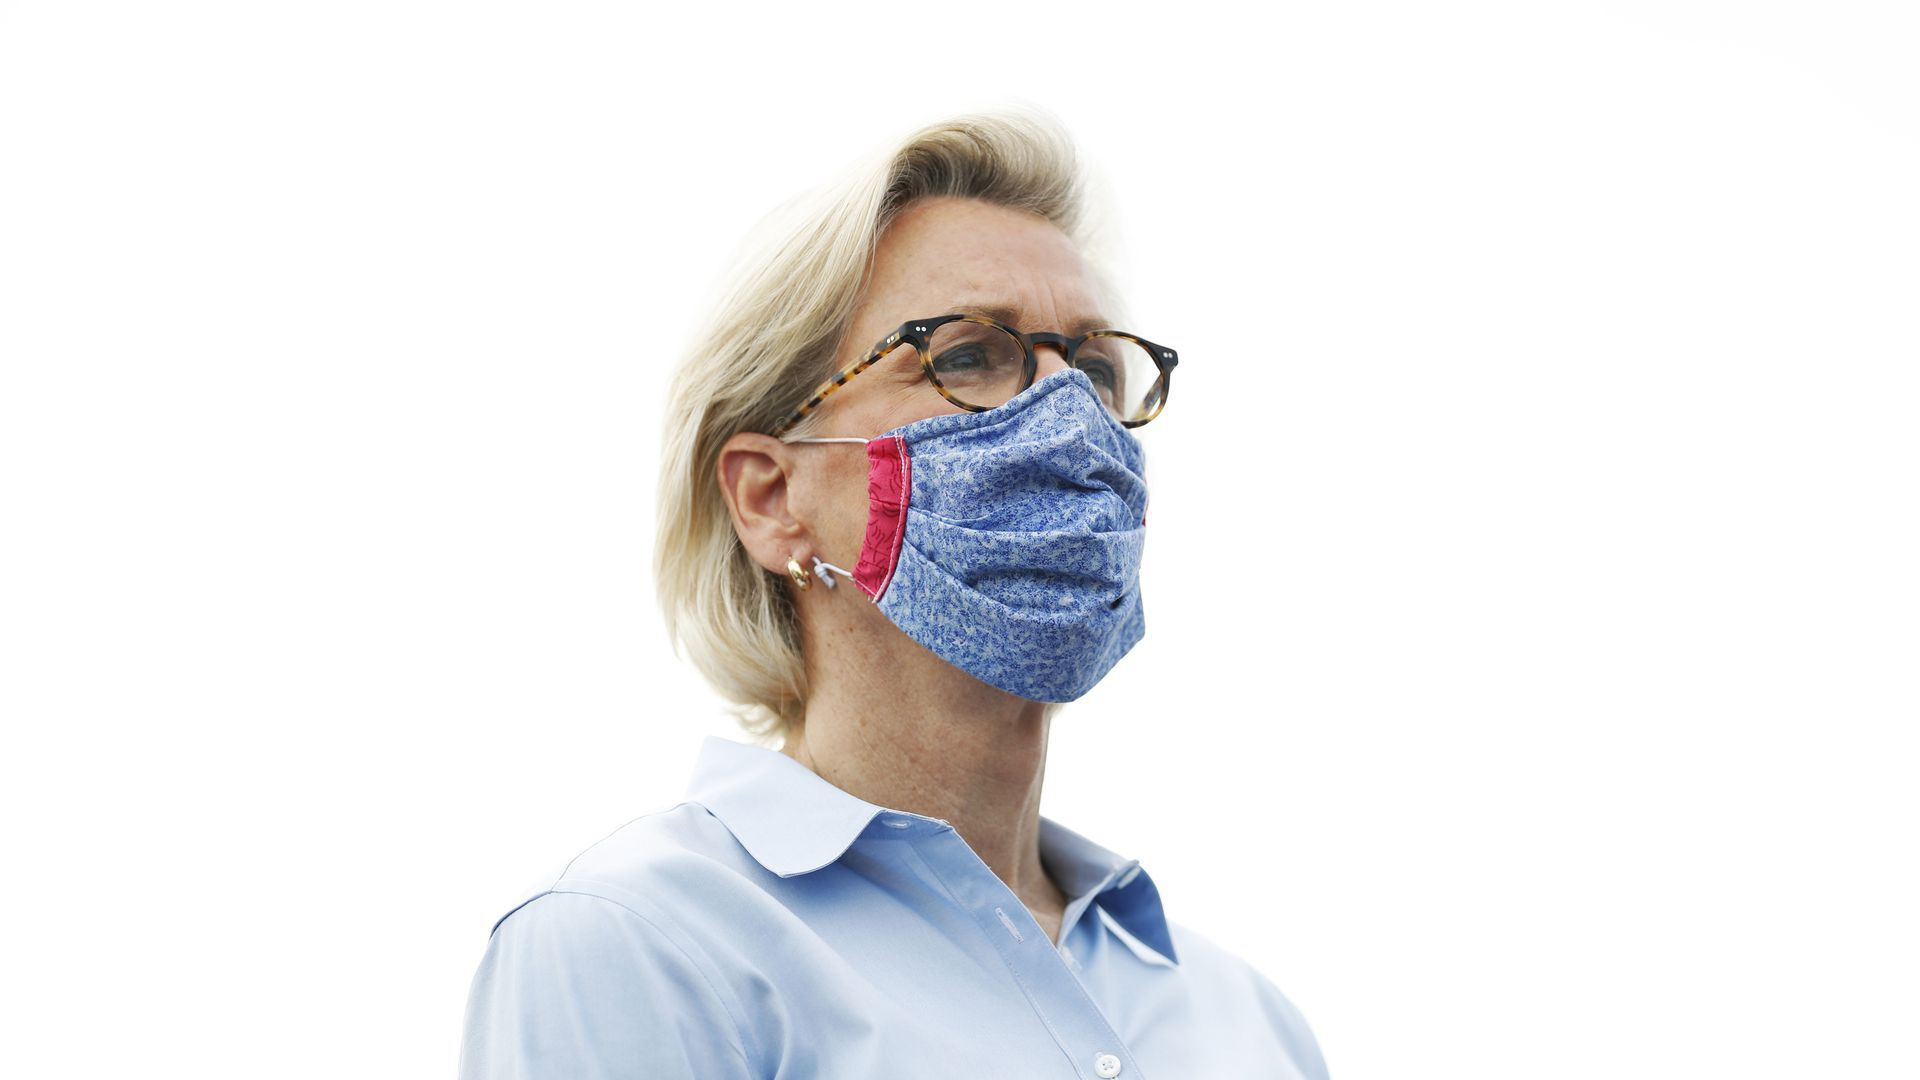 Tampa Mayor Jane Castor wearing a mask